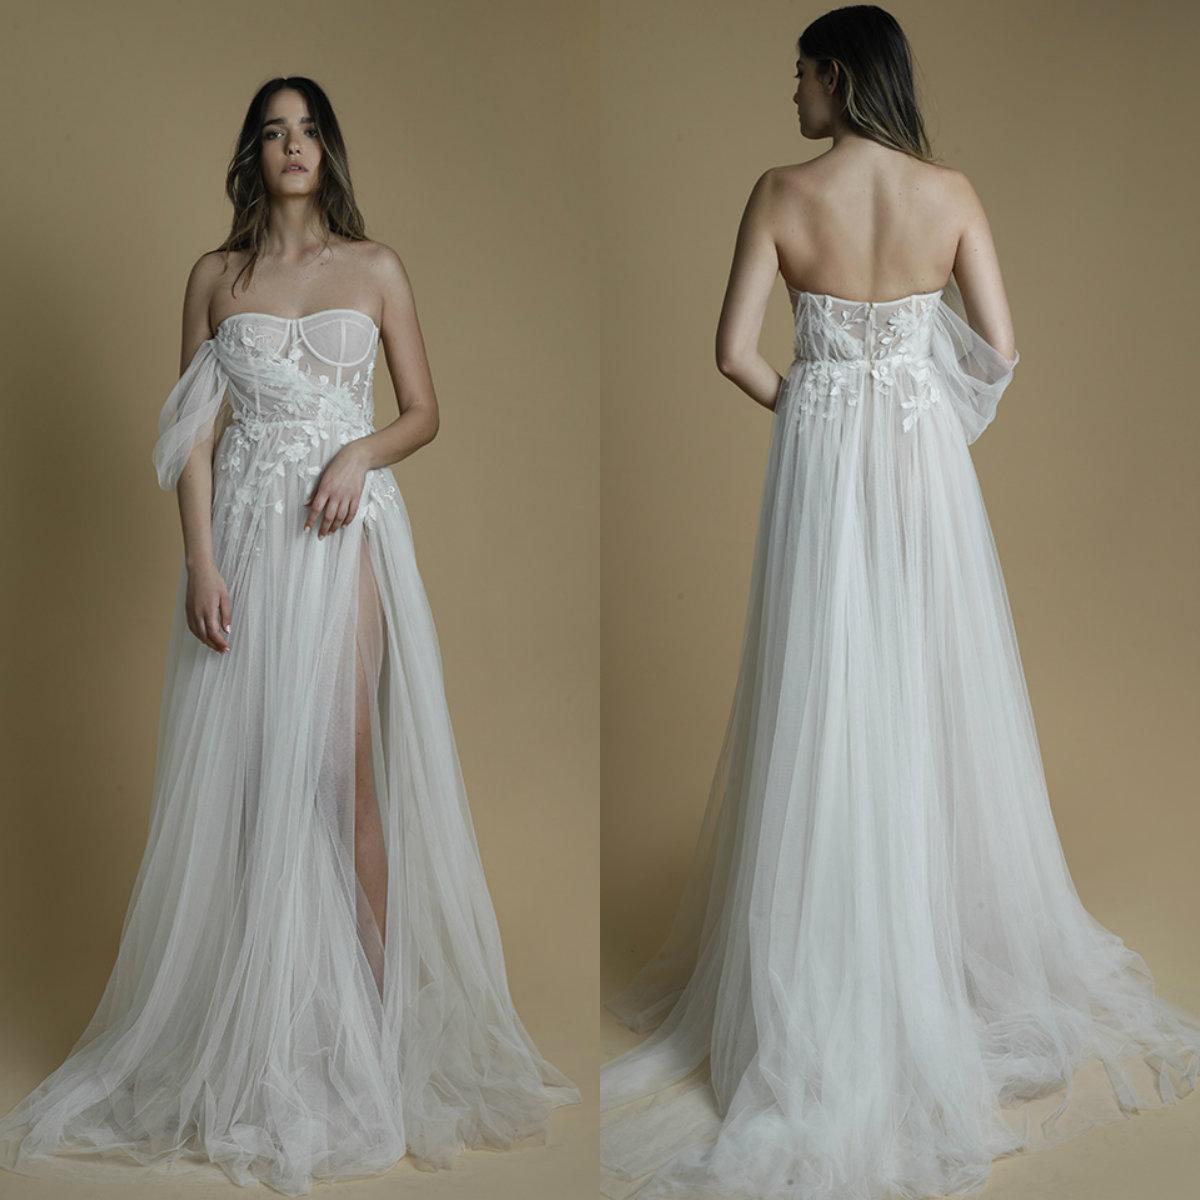 Liz Martinez High Side Split Wedding Dress Boho Chic Lace Appliqued Sweetheart Beach Style Wedding Gowns A Line Robes De Mariée